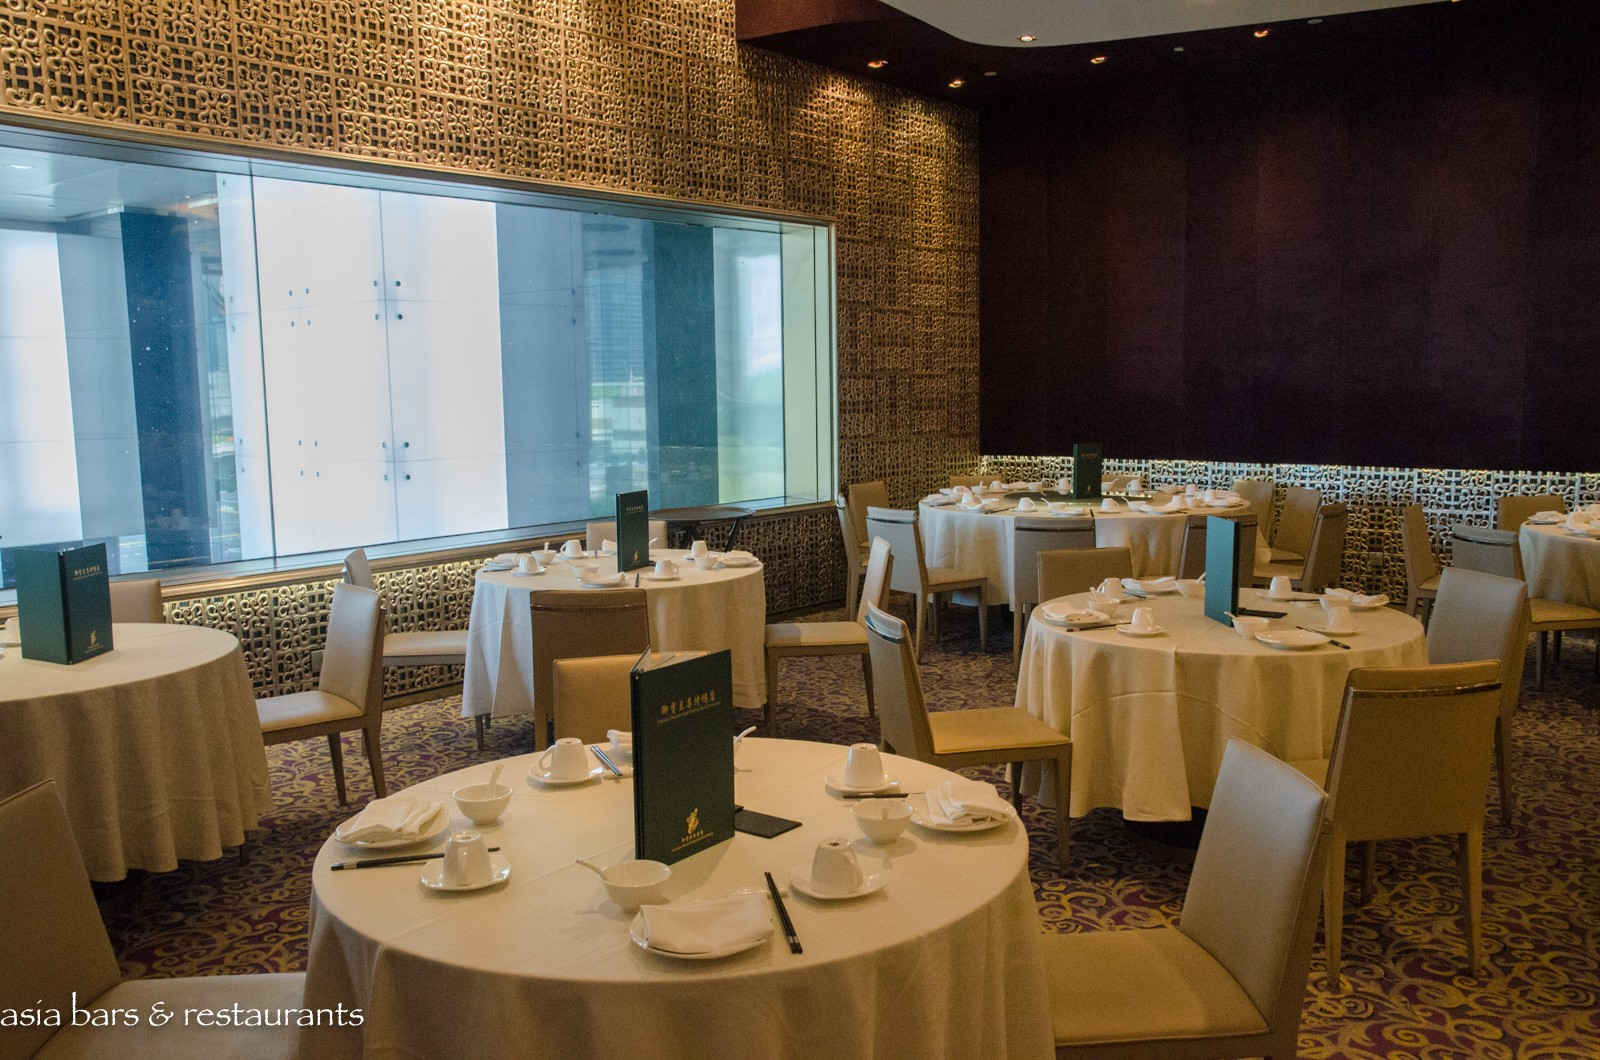 Imperial Treasure Super Peking Duck – Chinese restaurant in Singapore | Asia Bars & Restaurants